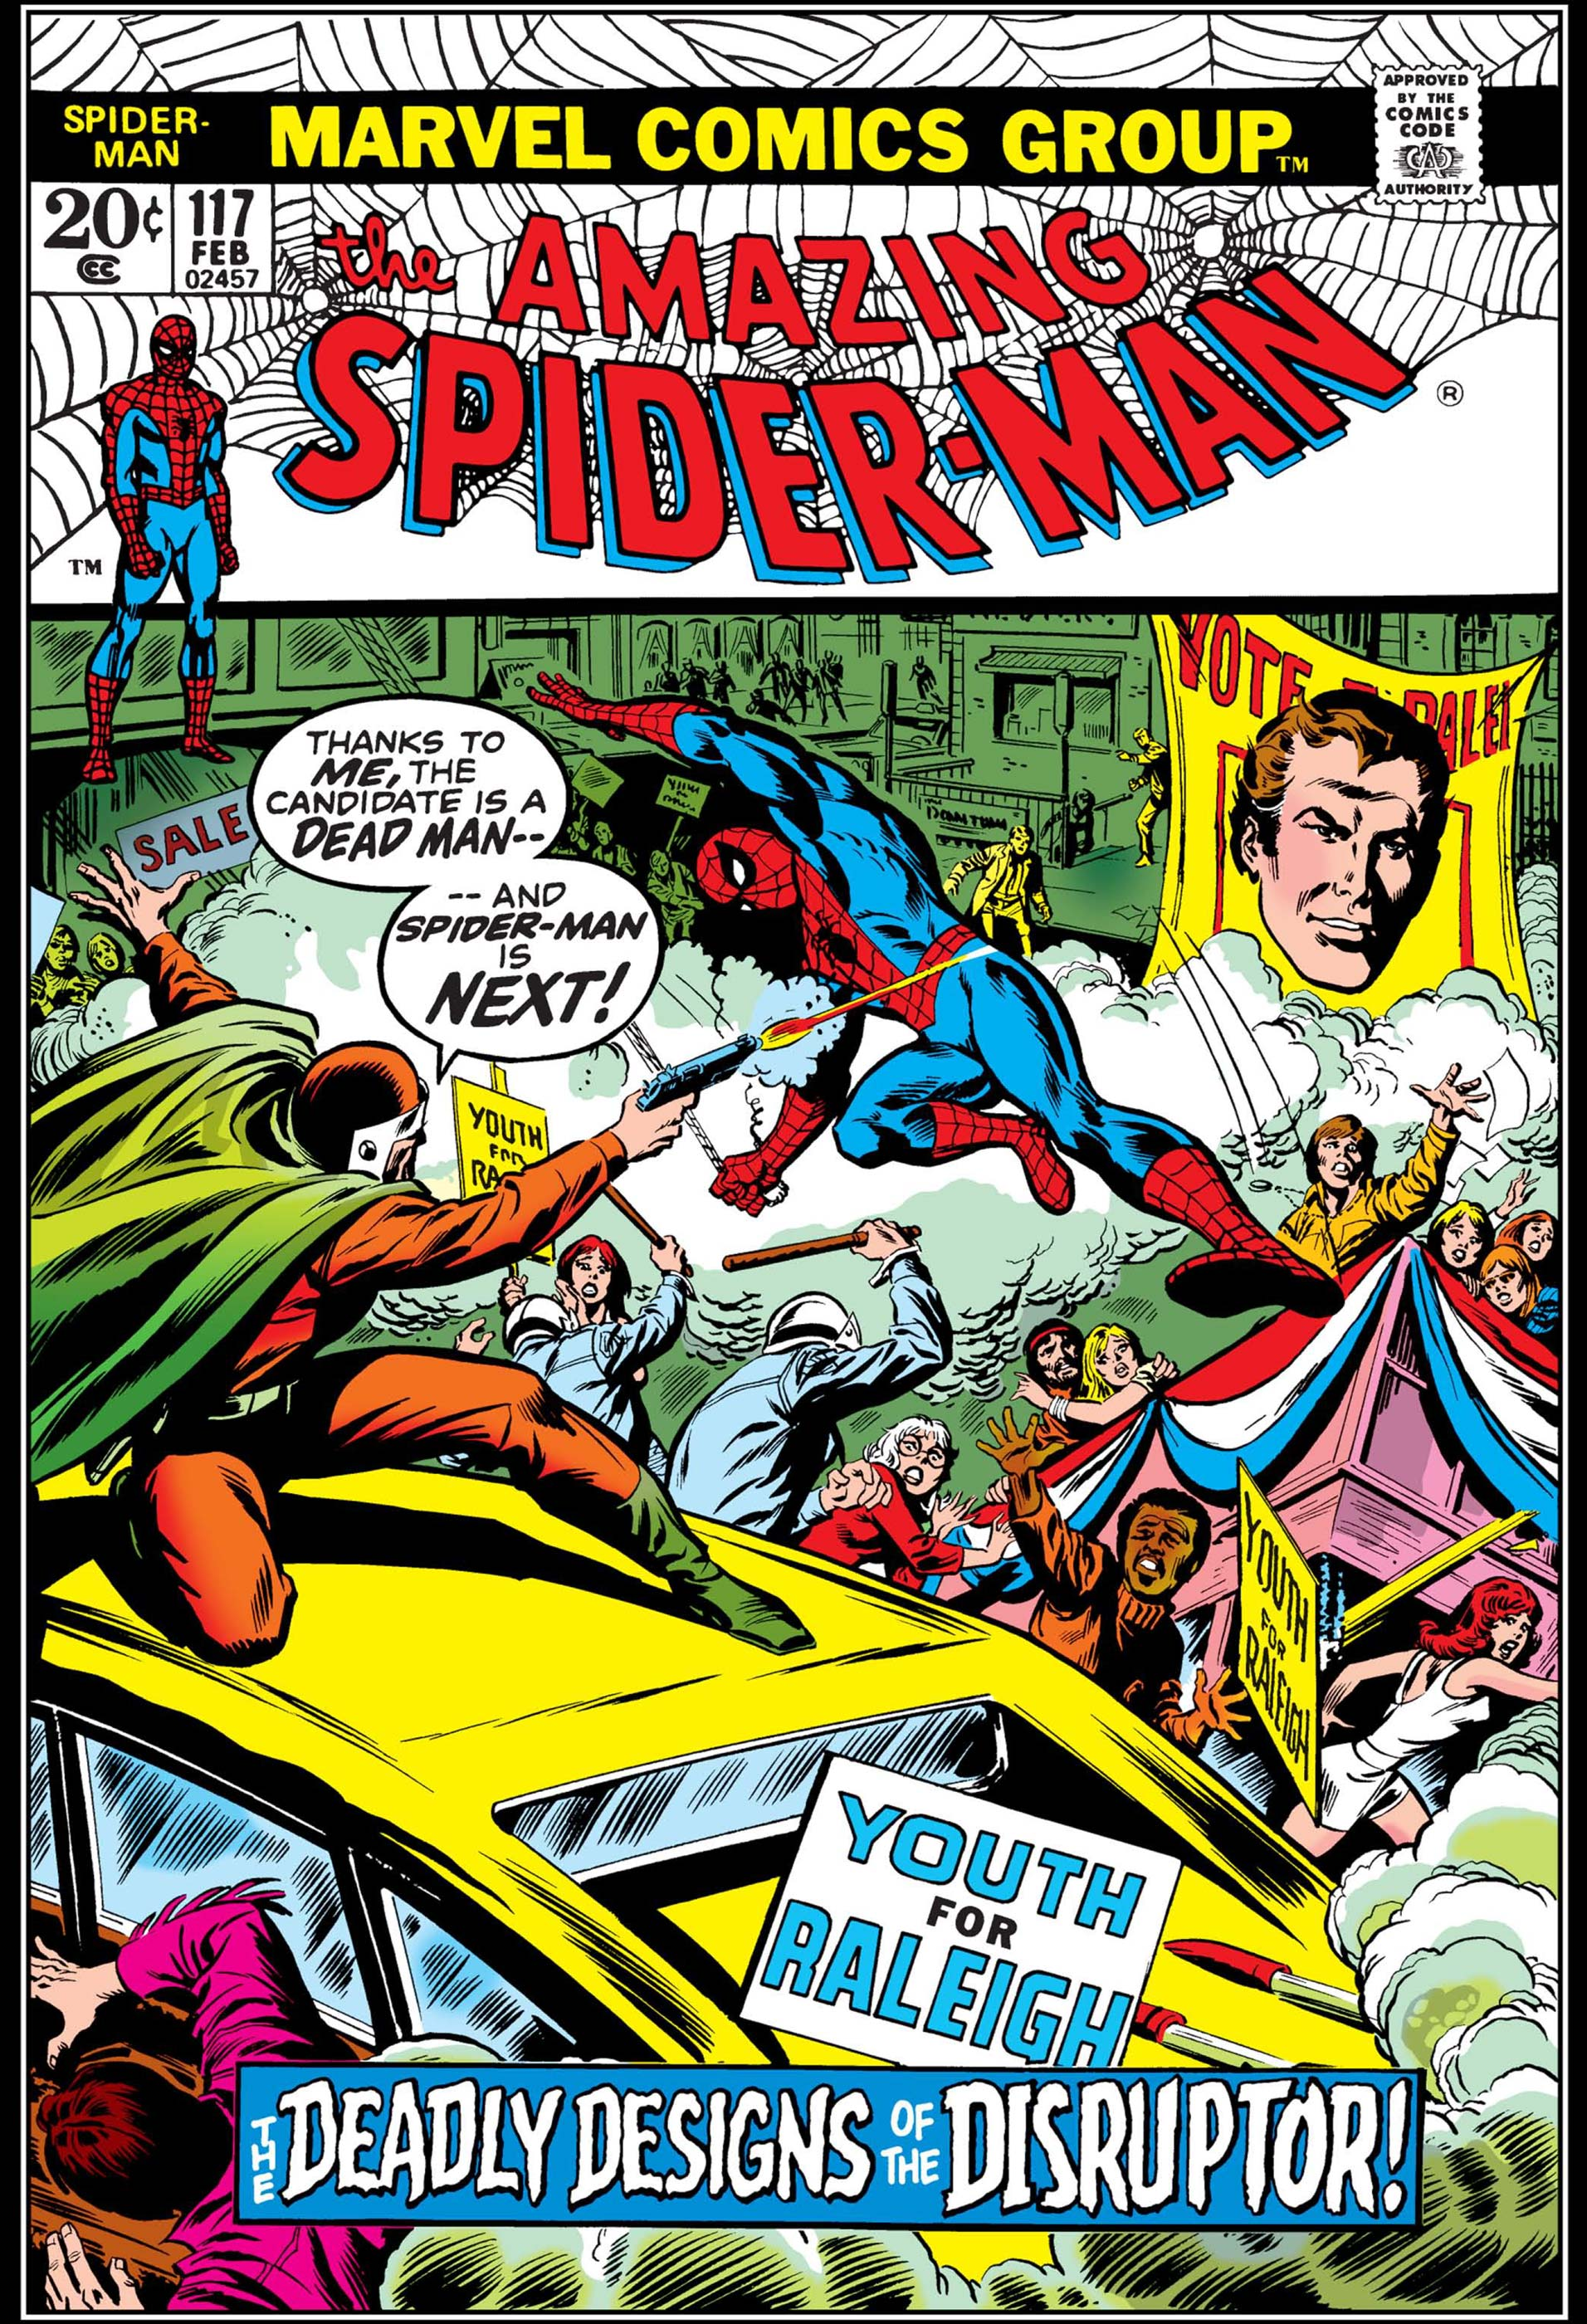 The Amazing Spider-Man (1963) #117